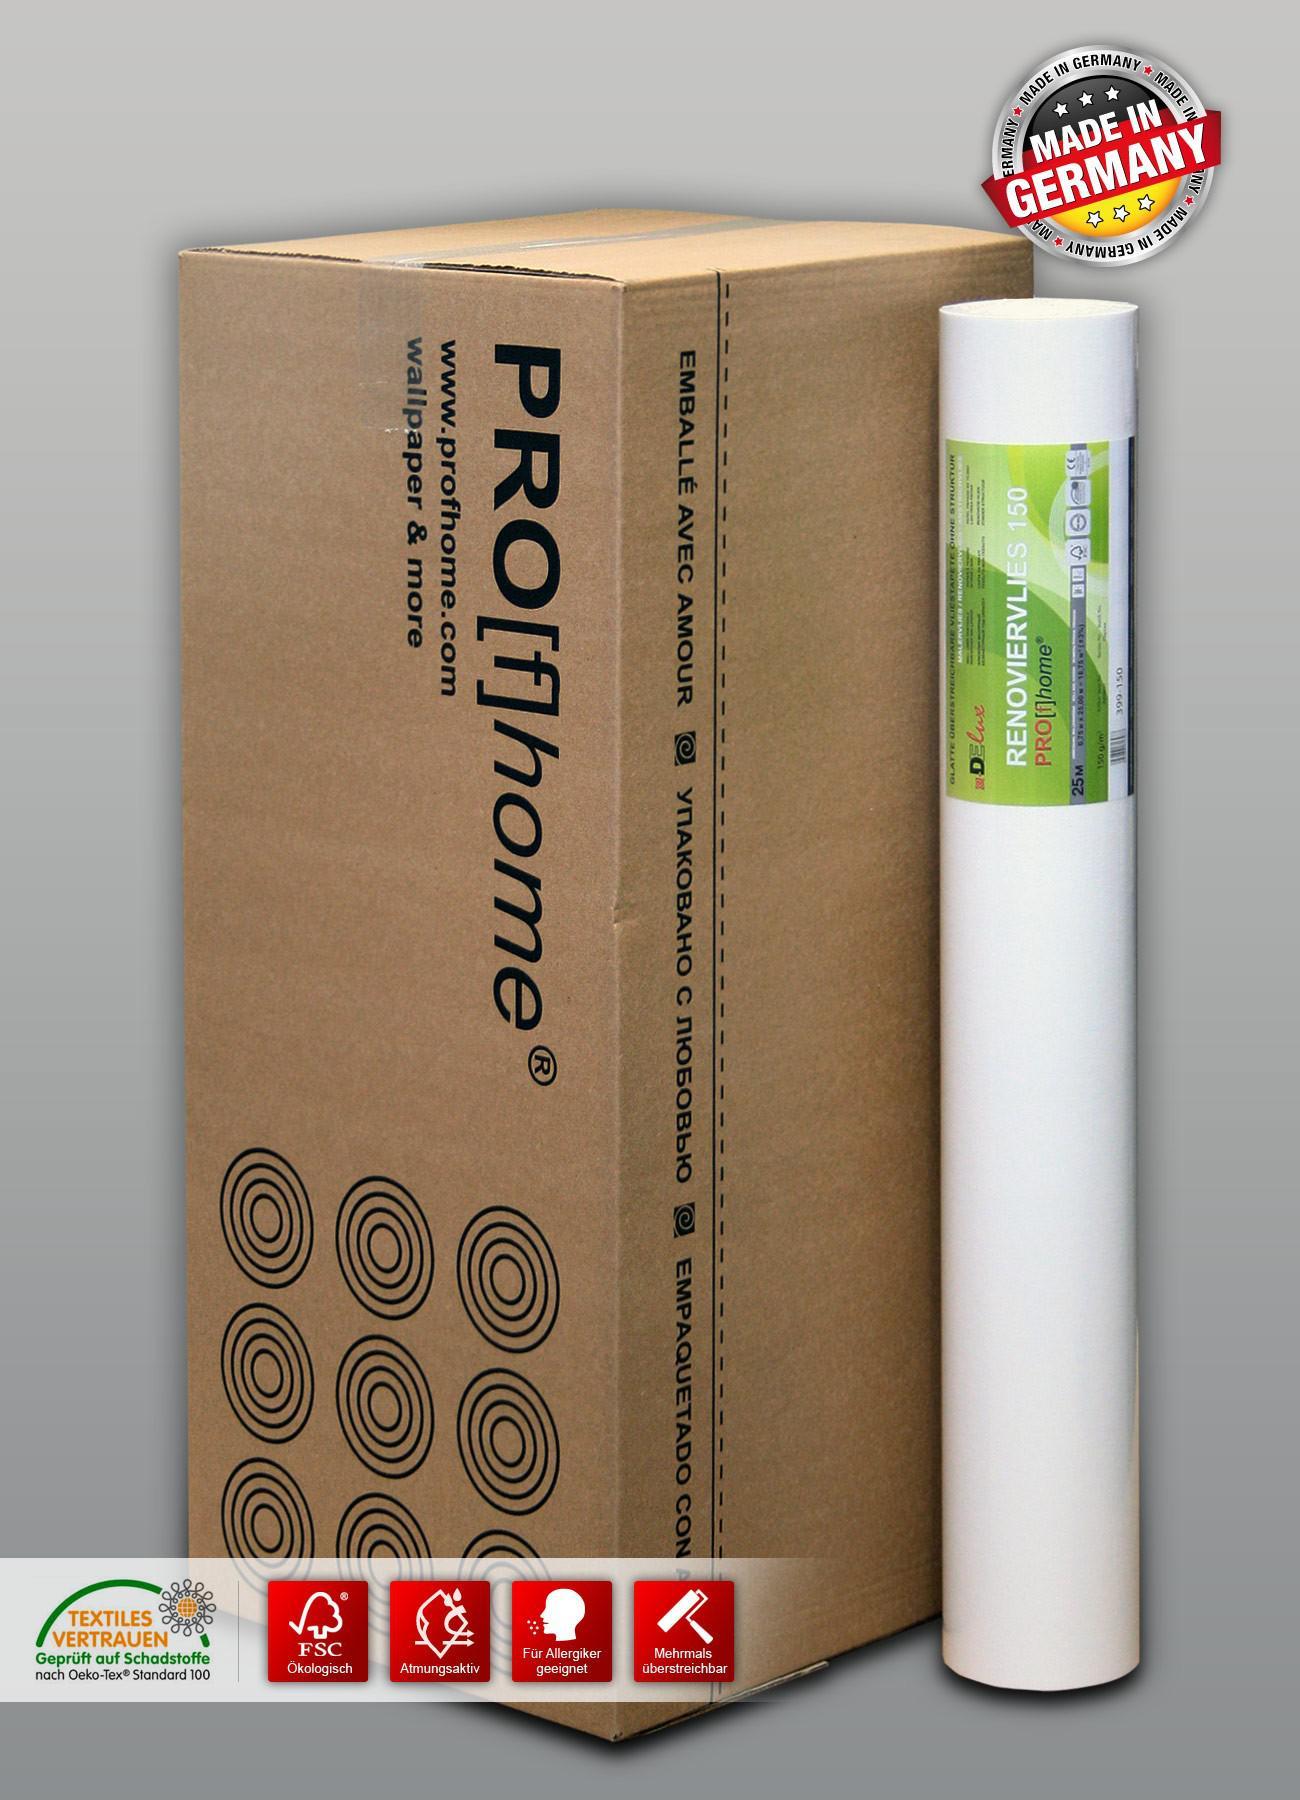 anstrichvlies renoviervlies 150 g malervlies profhome saniervlies 168 75 m2 1 karton 9 rollen. Black Bedroom Furniture Sets. Home Design Ideas